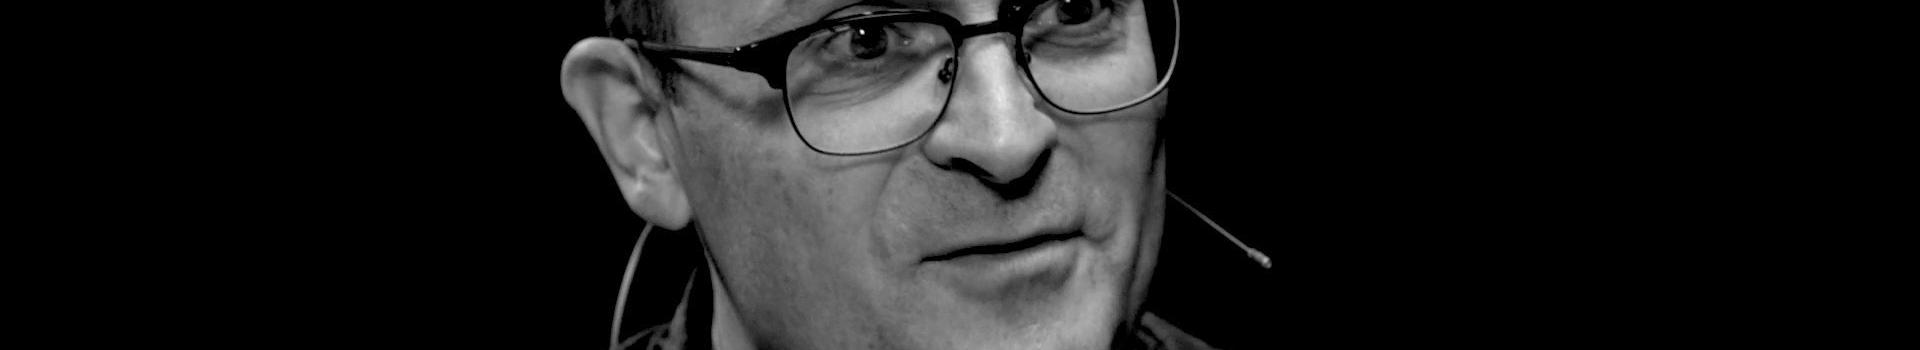 CDS Radio – 'Iedereen gelooft' met Luk Vanmaercke